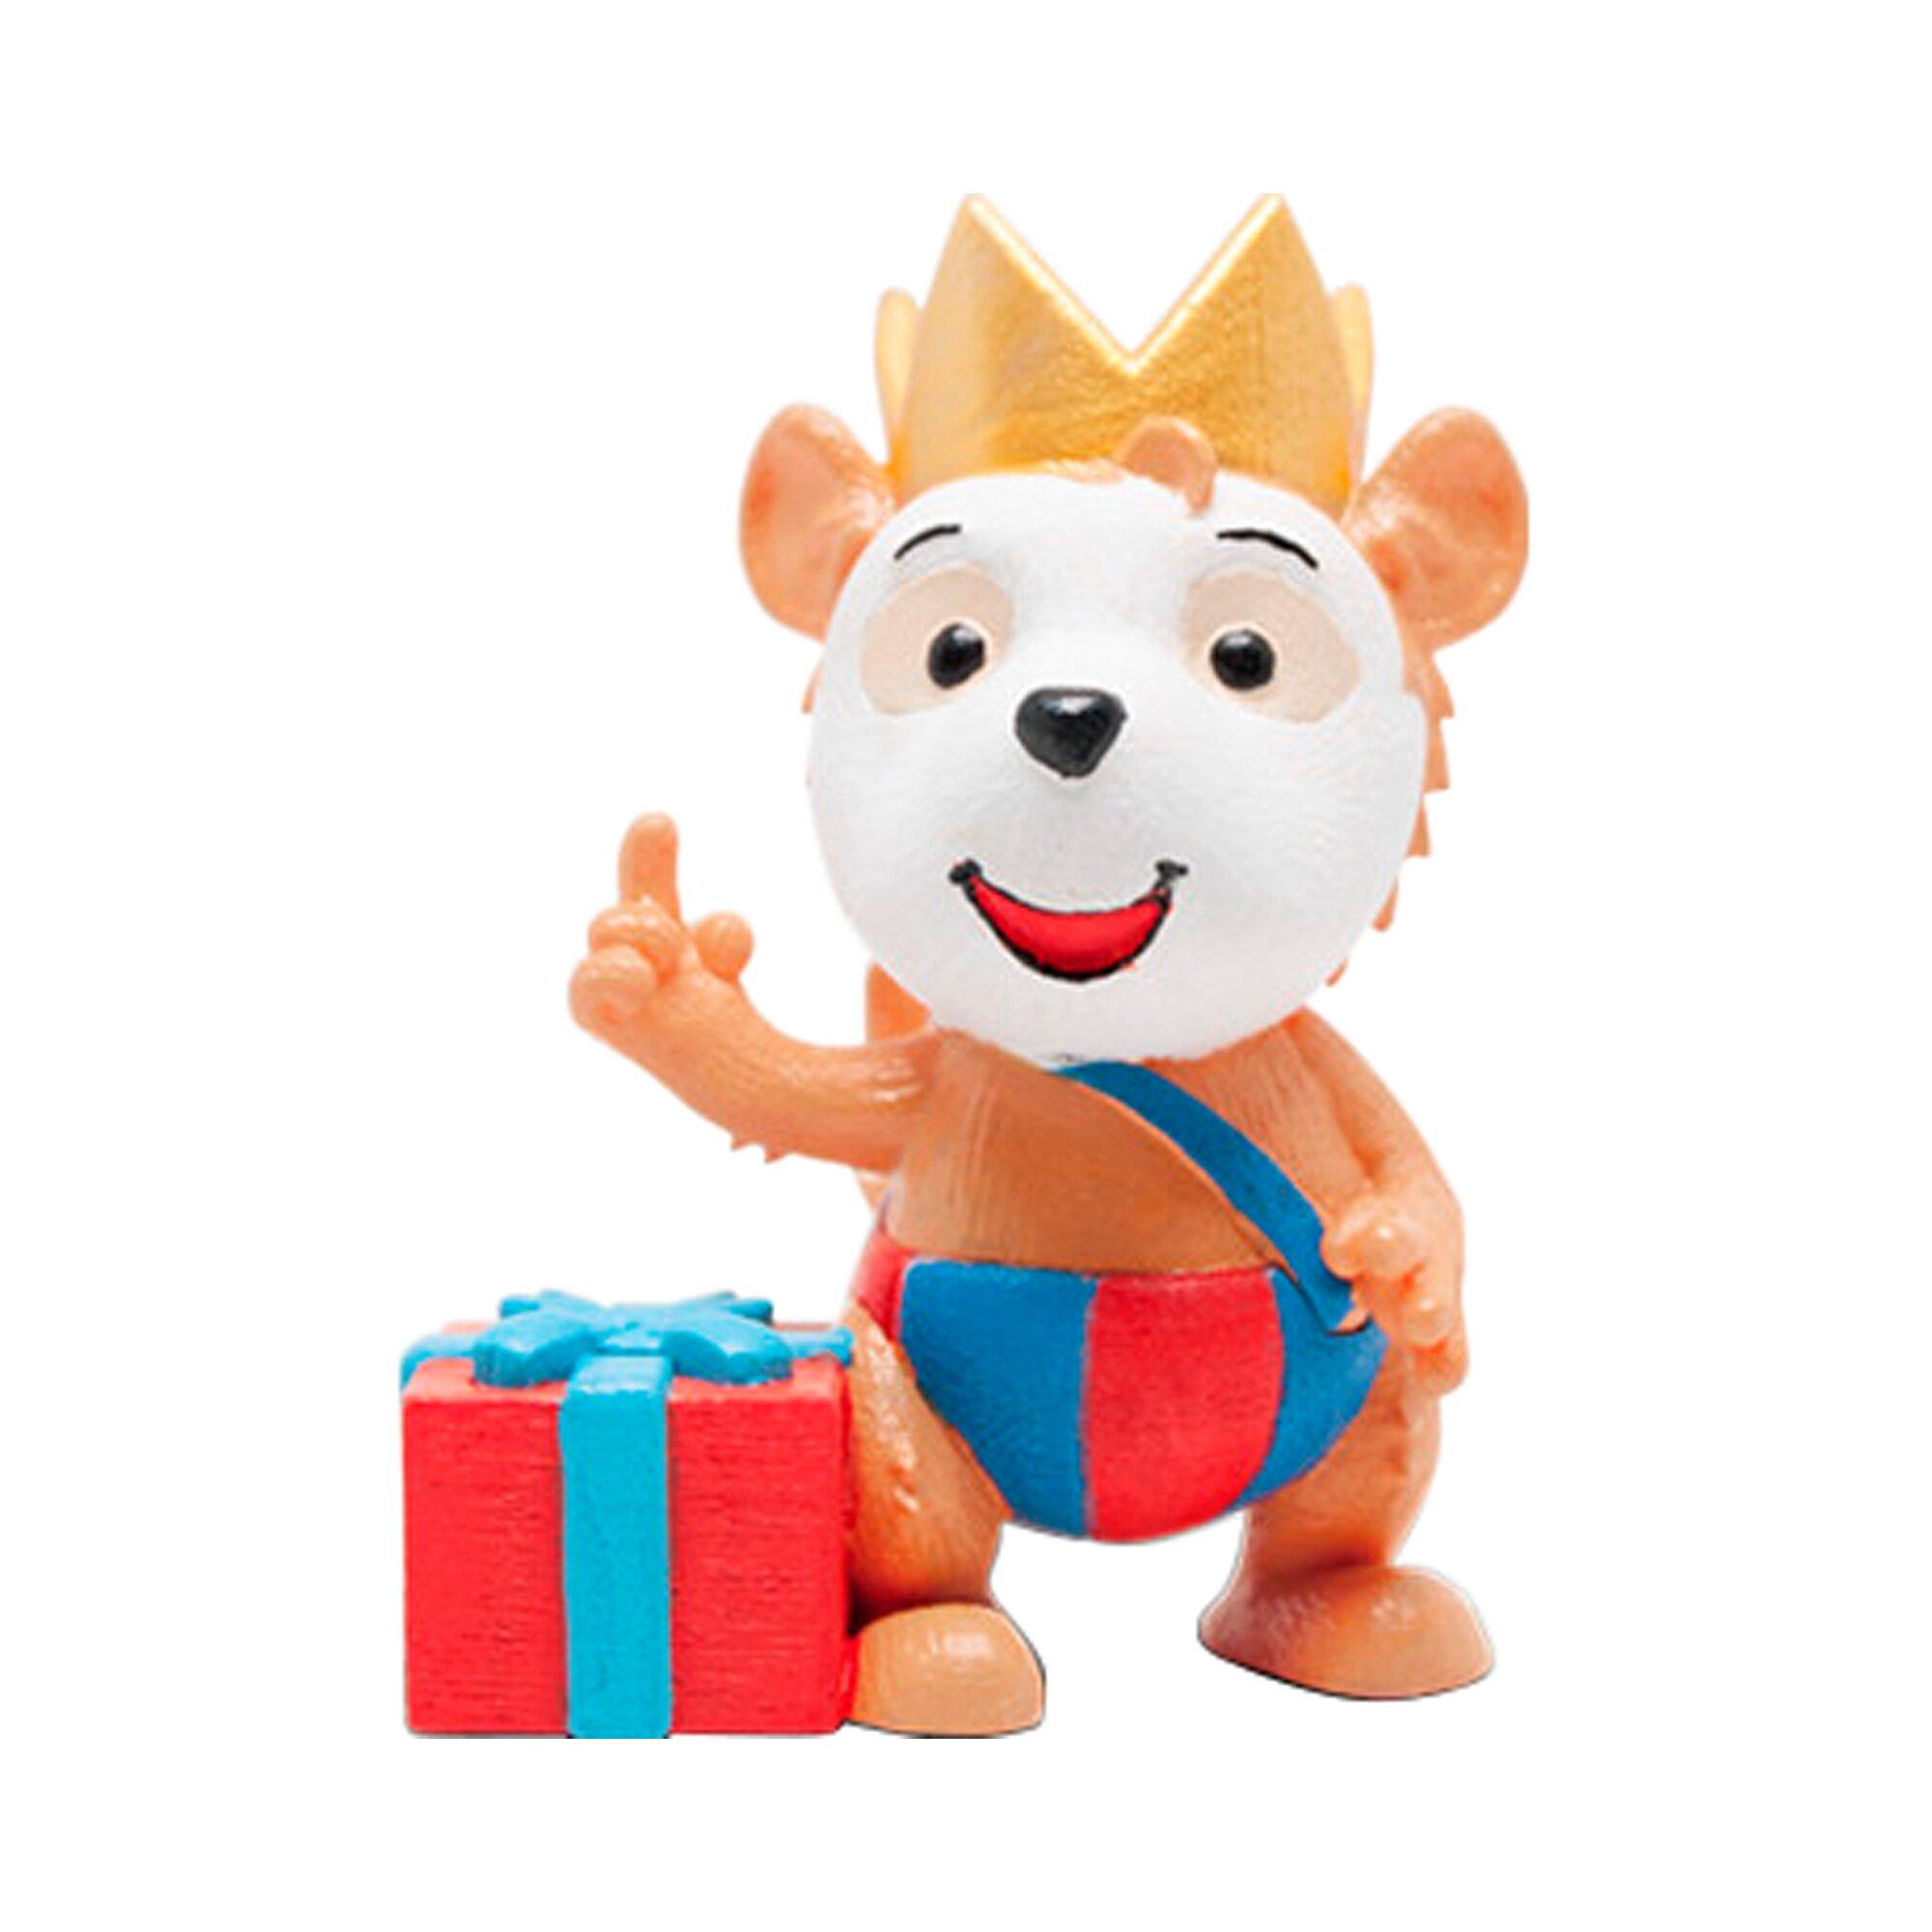 tonies-tonie-horfigur-bobo-siebenschlafer-bobo-feiert-kindergeburtstag